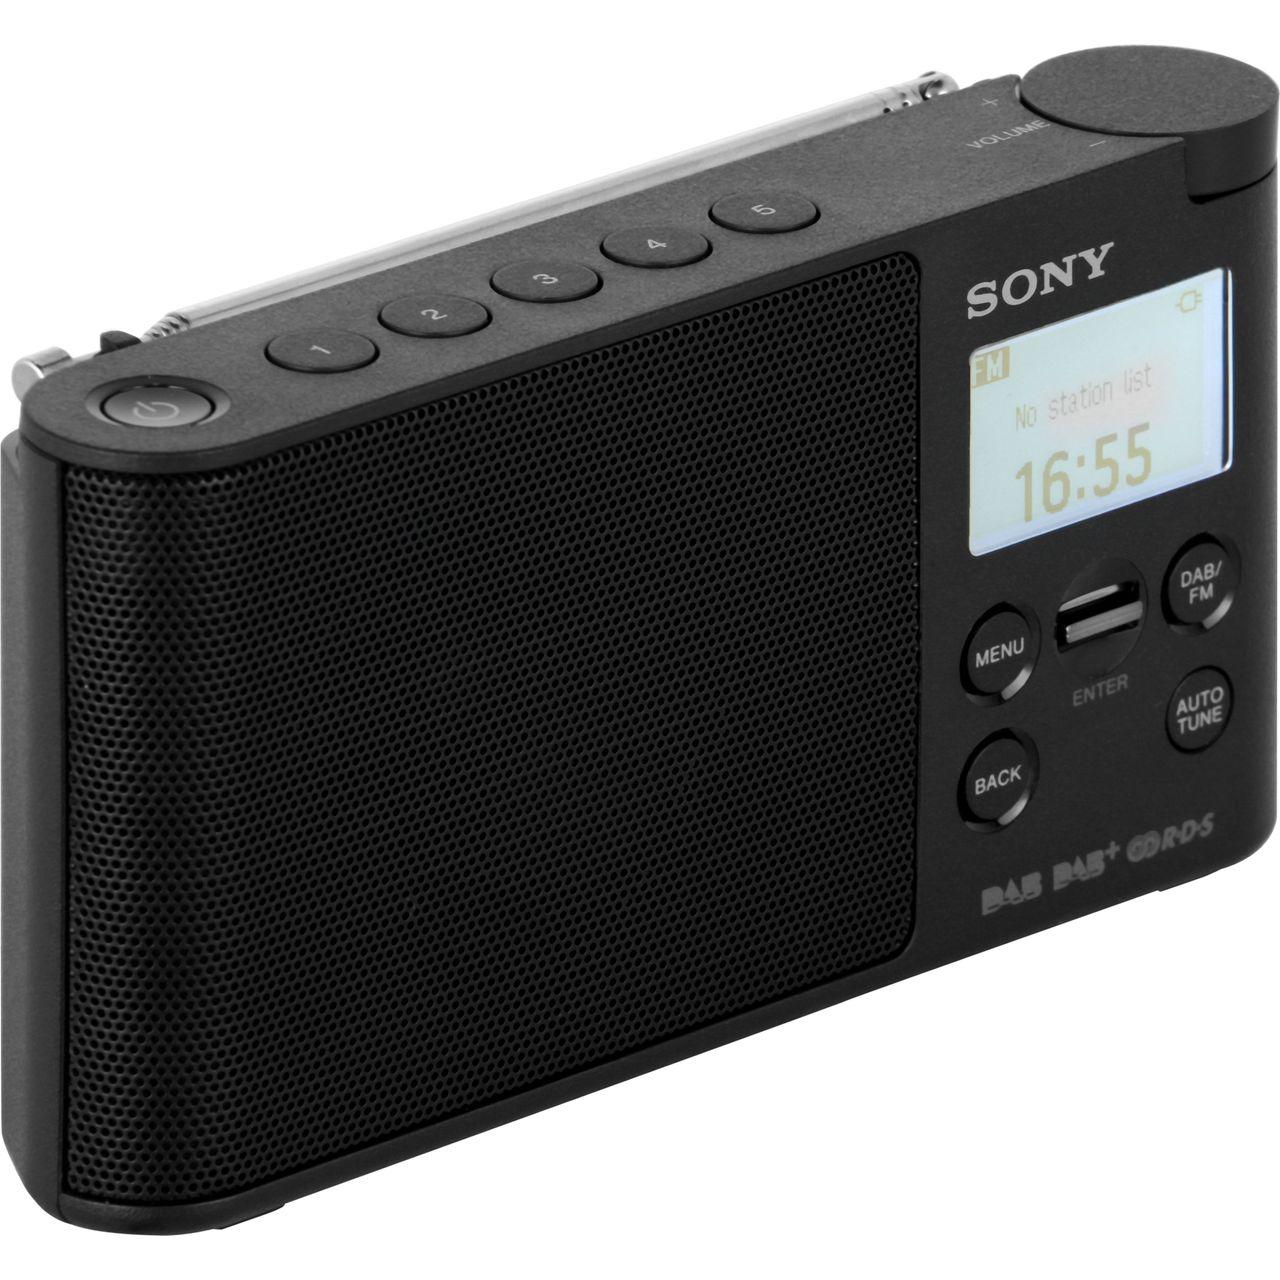 sony xdrs41db cek portable dab dab wireless radio with. Black Bedroom Furniture Sets. Home Design Ideas